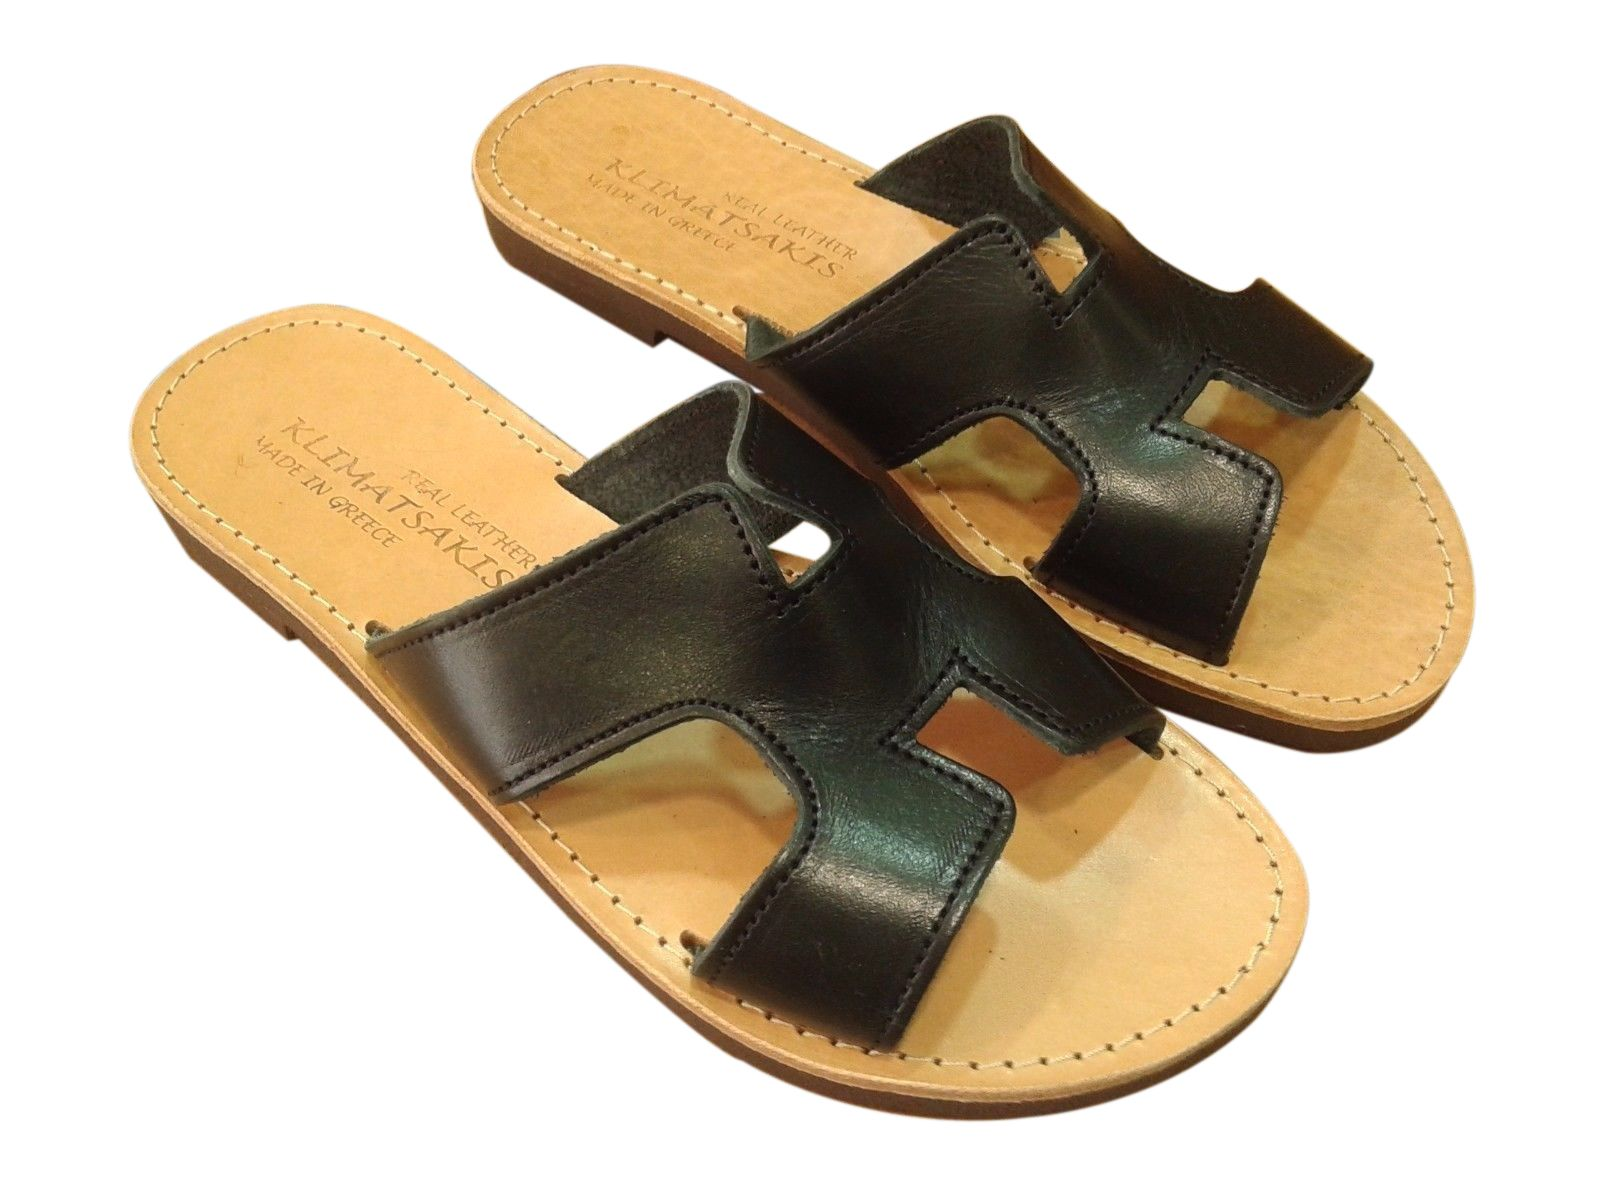 331c2c6df342 Ancient Greek Style Leather H Sandals Roman Handmade Womens Slide Shoes  Gladiator Spartan Hermes Summer Black